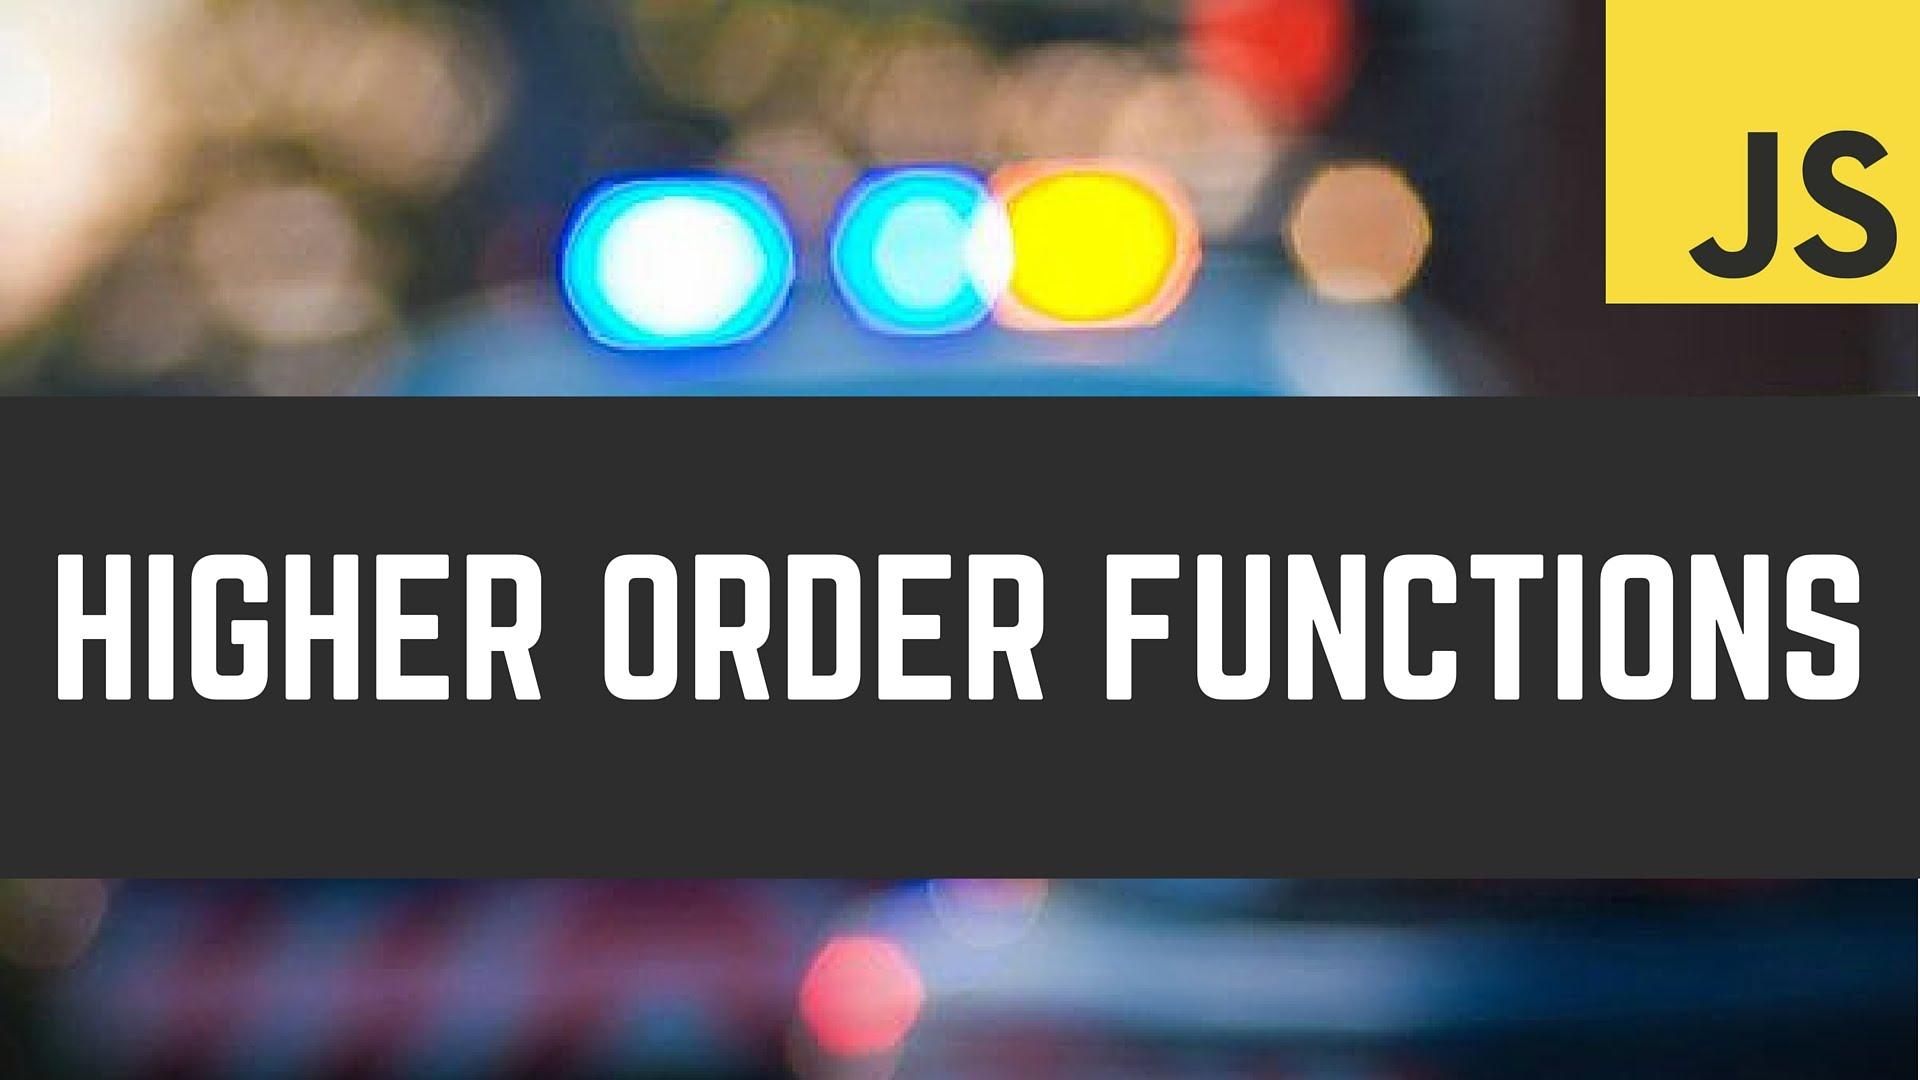 توابع مرتبه بالا(Higher-Order Functions) در جاوا اسکریپت